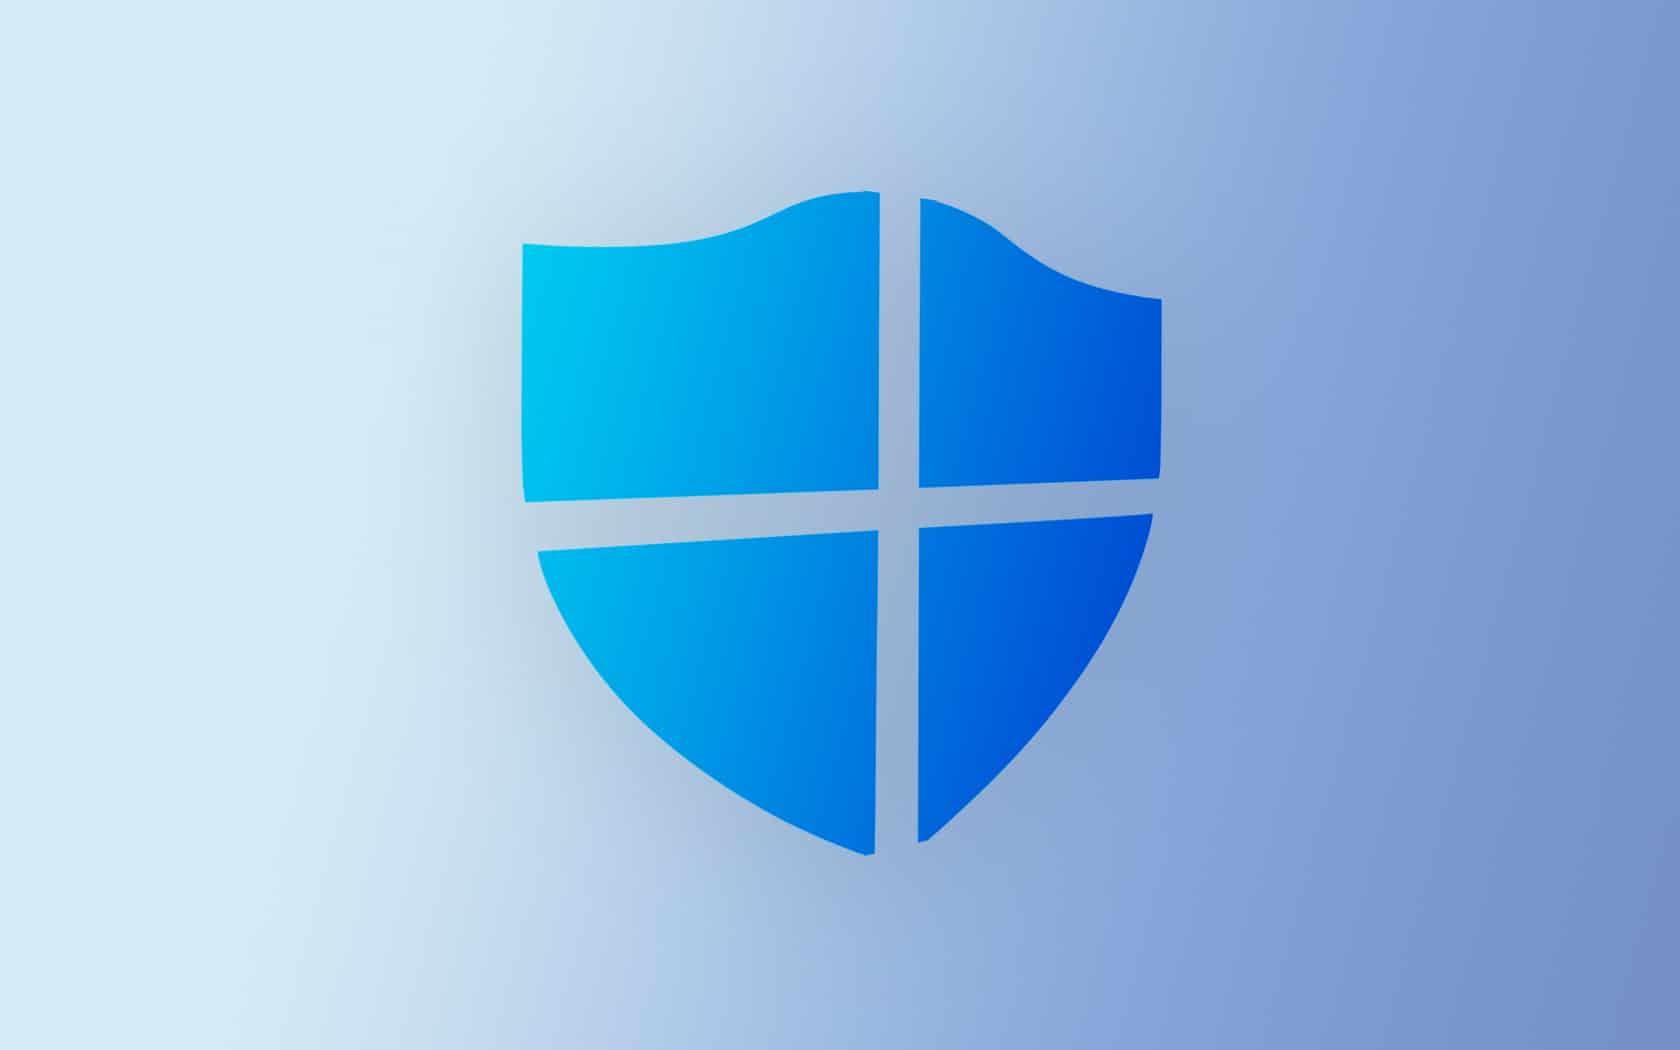 L'antivirus Microsoft Defender ATP débarque bientôt sur Android et iOS - PhonAndroid.com